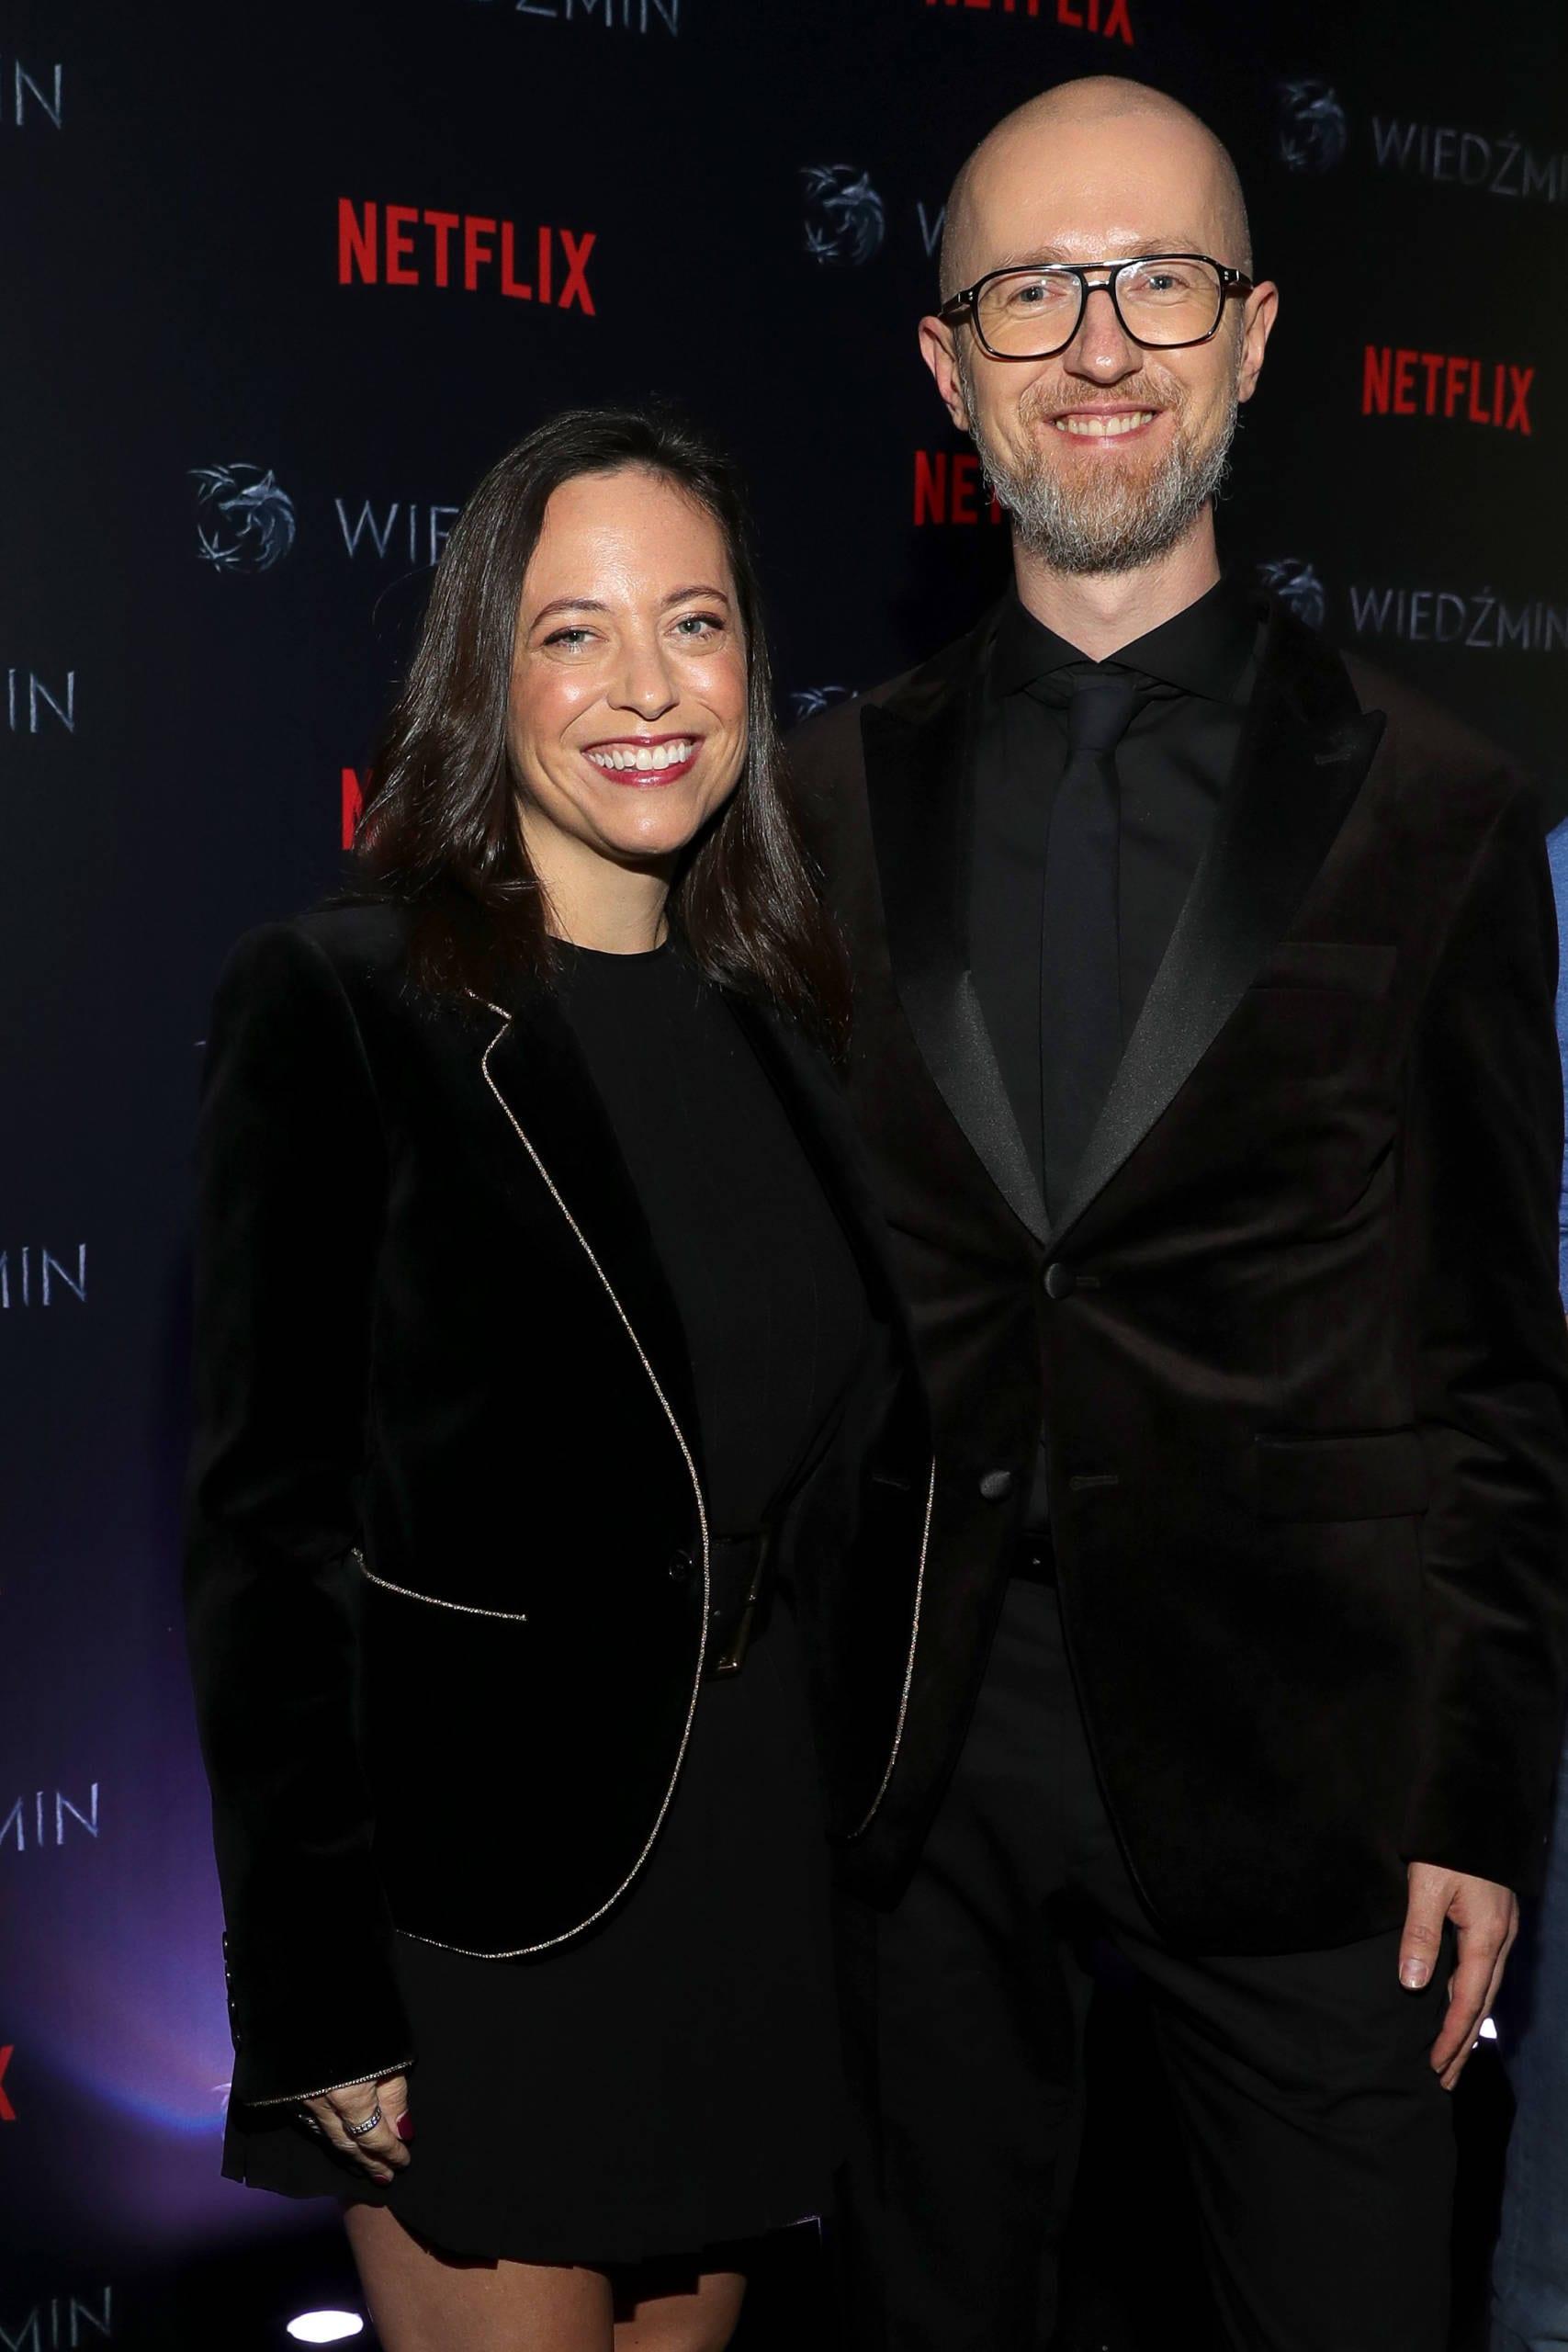 """the Witcher"" Netflix Premiere In Warsaw"